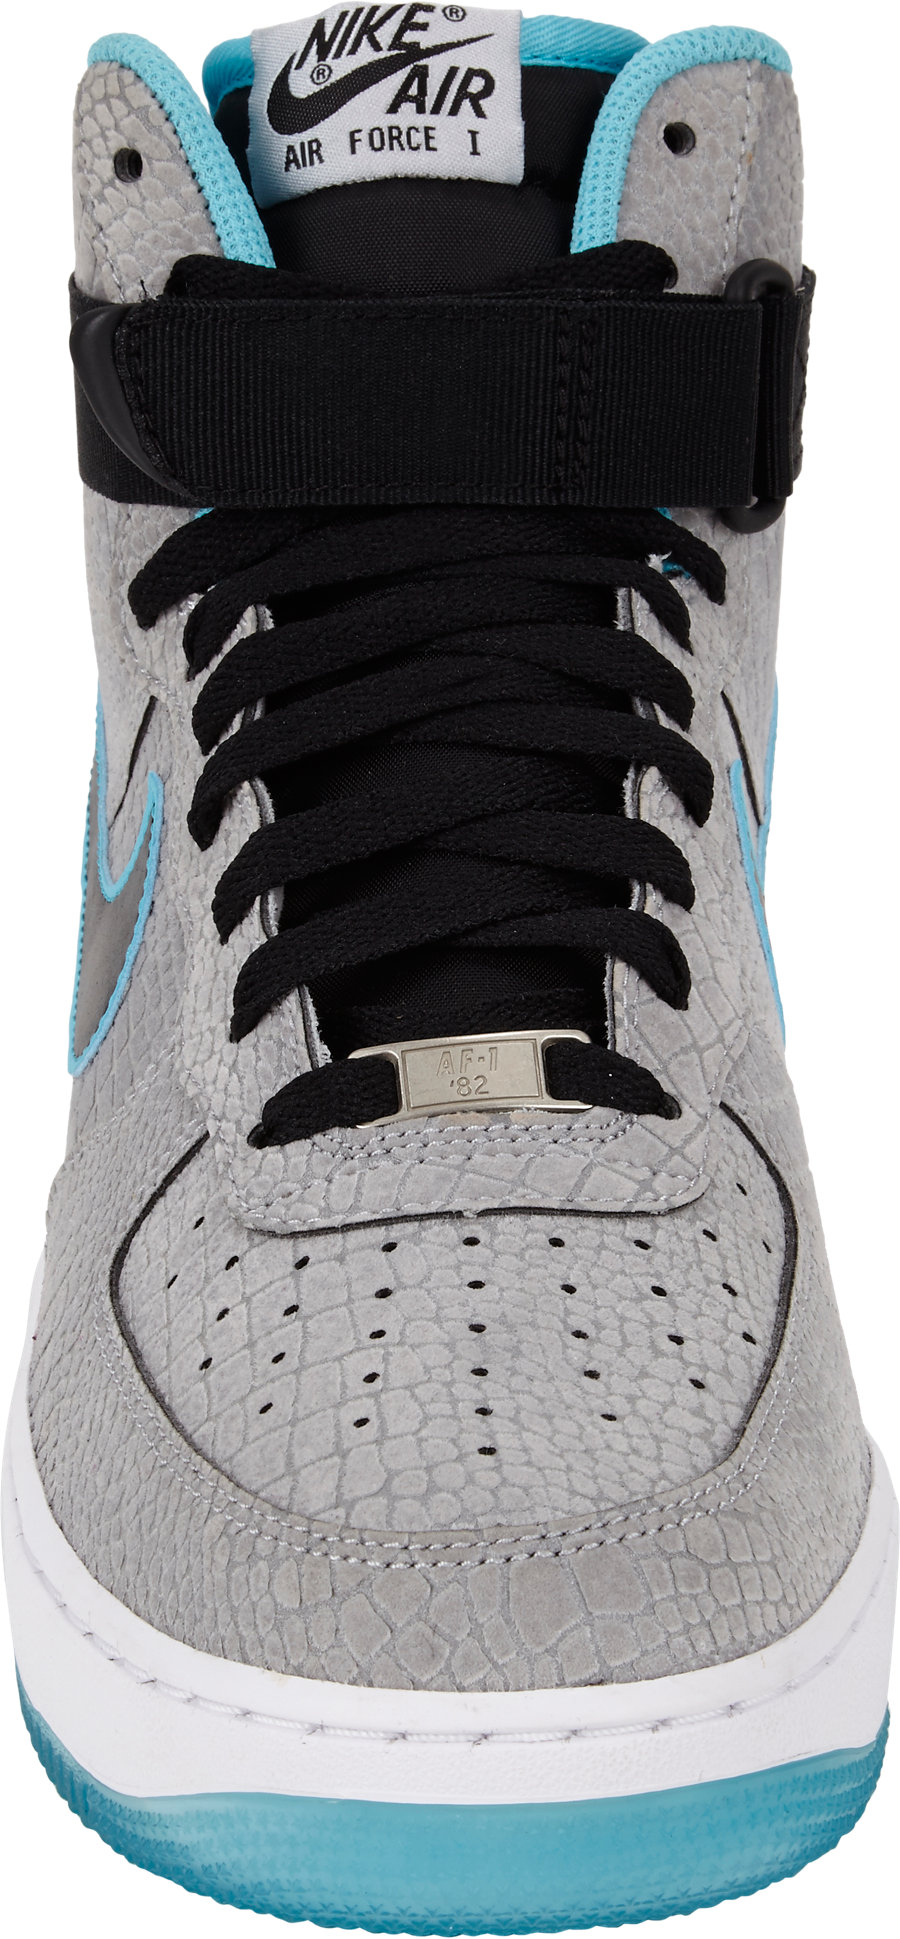 the latest f1887 e8e81 ... store lyst nike air force 1 hi premium comfort sneakers in blue for men  dedfe b578b ...